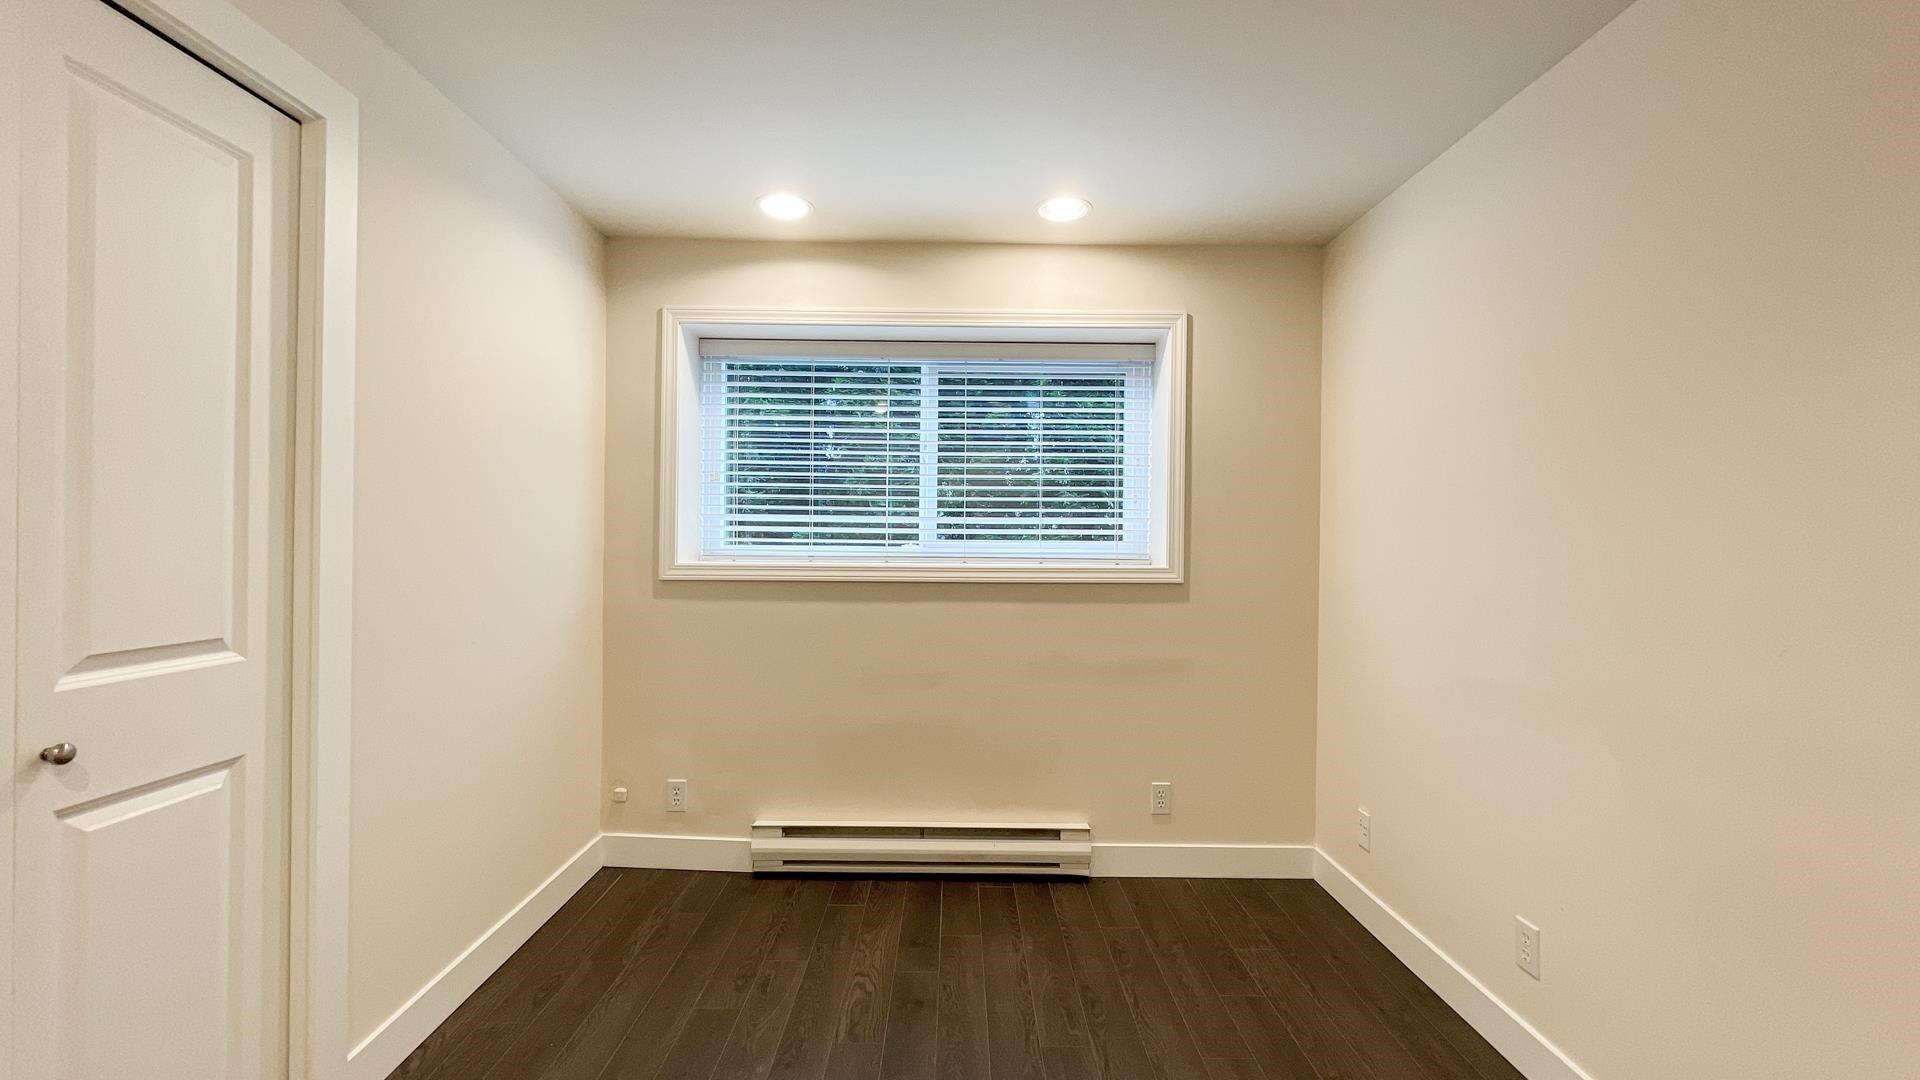 1168 JEFFERSON AVENUE - Ambleside House/Single Family for sale, 6 Bedrooms (R2602275) - #16